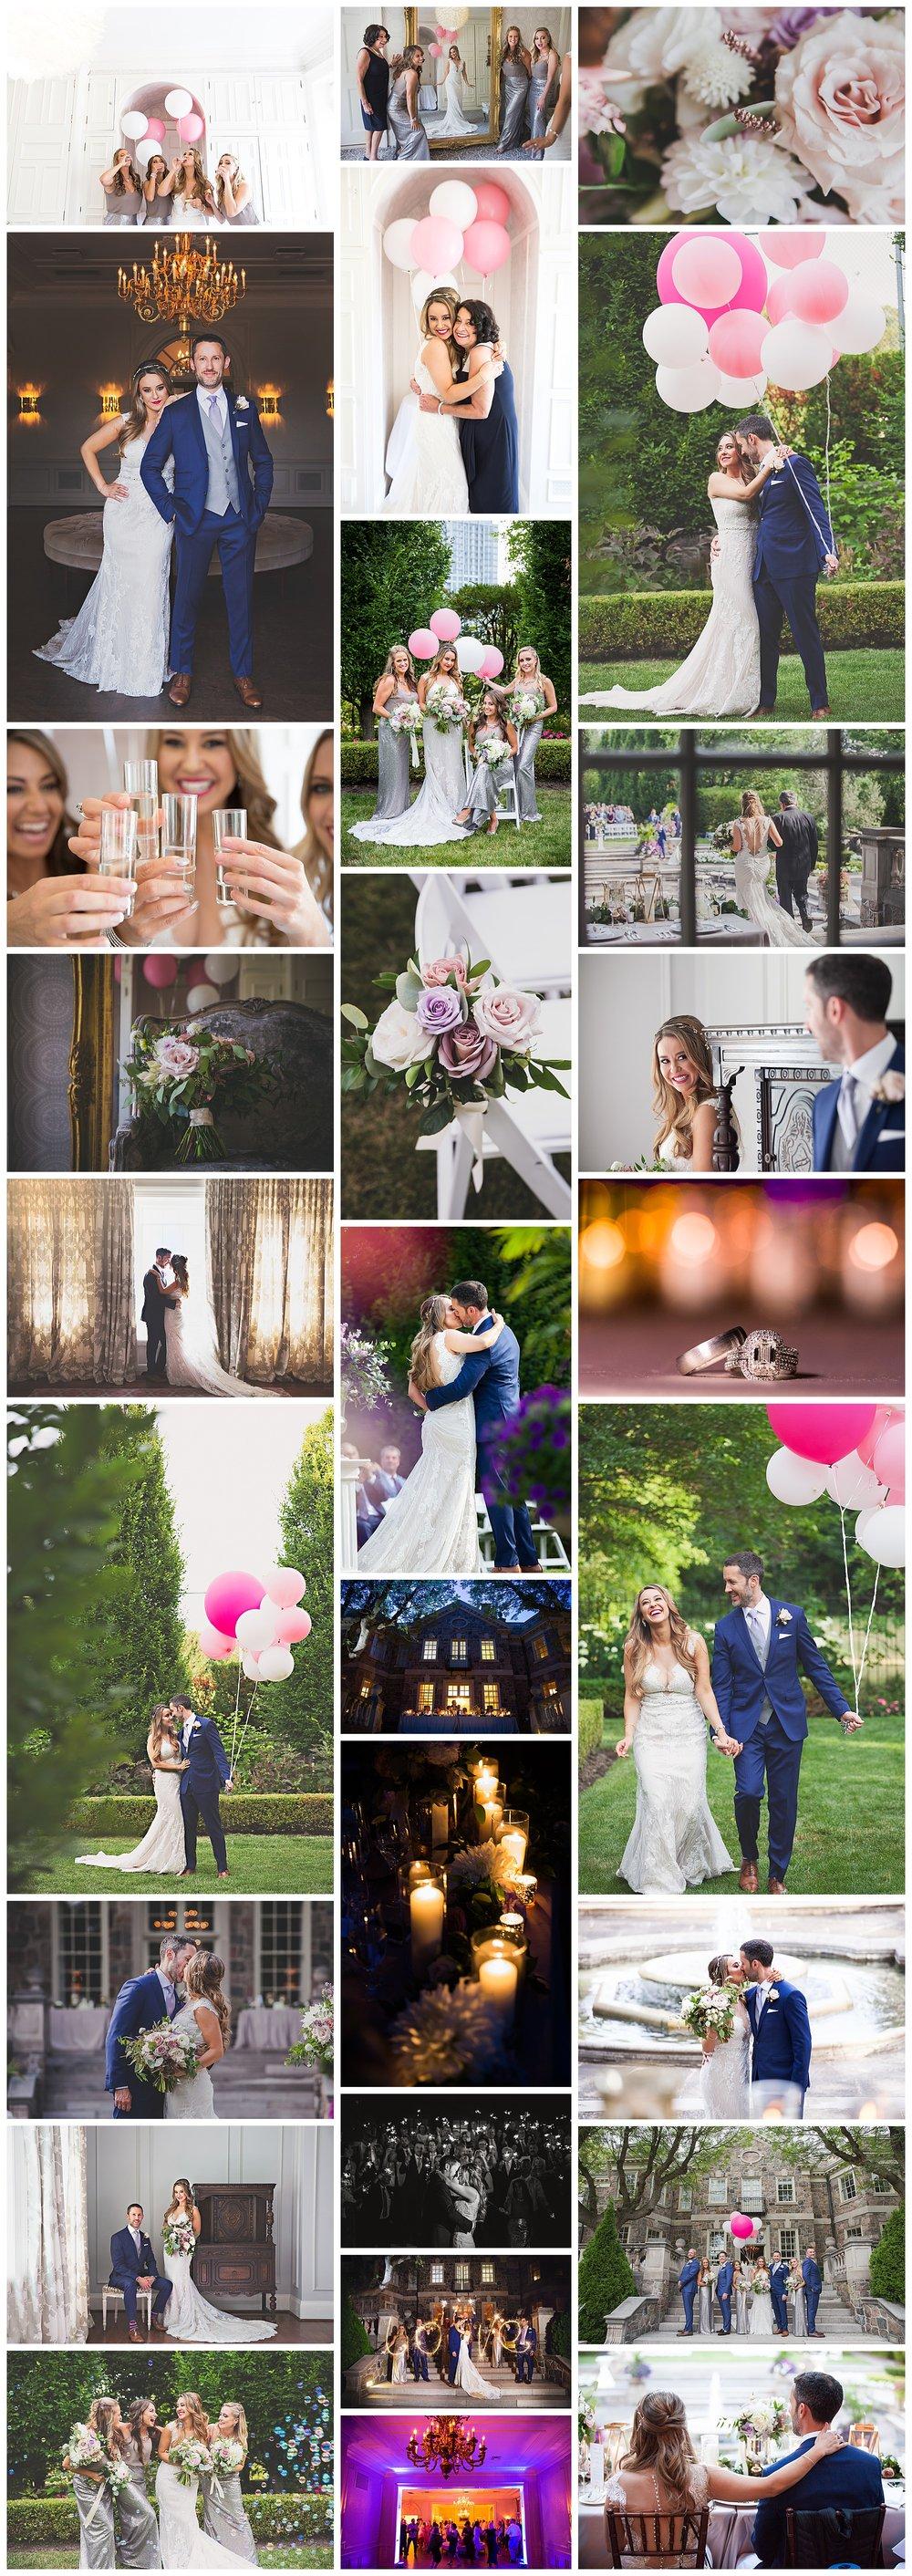 Graydon Hall Manor, Toronto, Ontario wedding photos by Van Daele & Russell